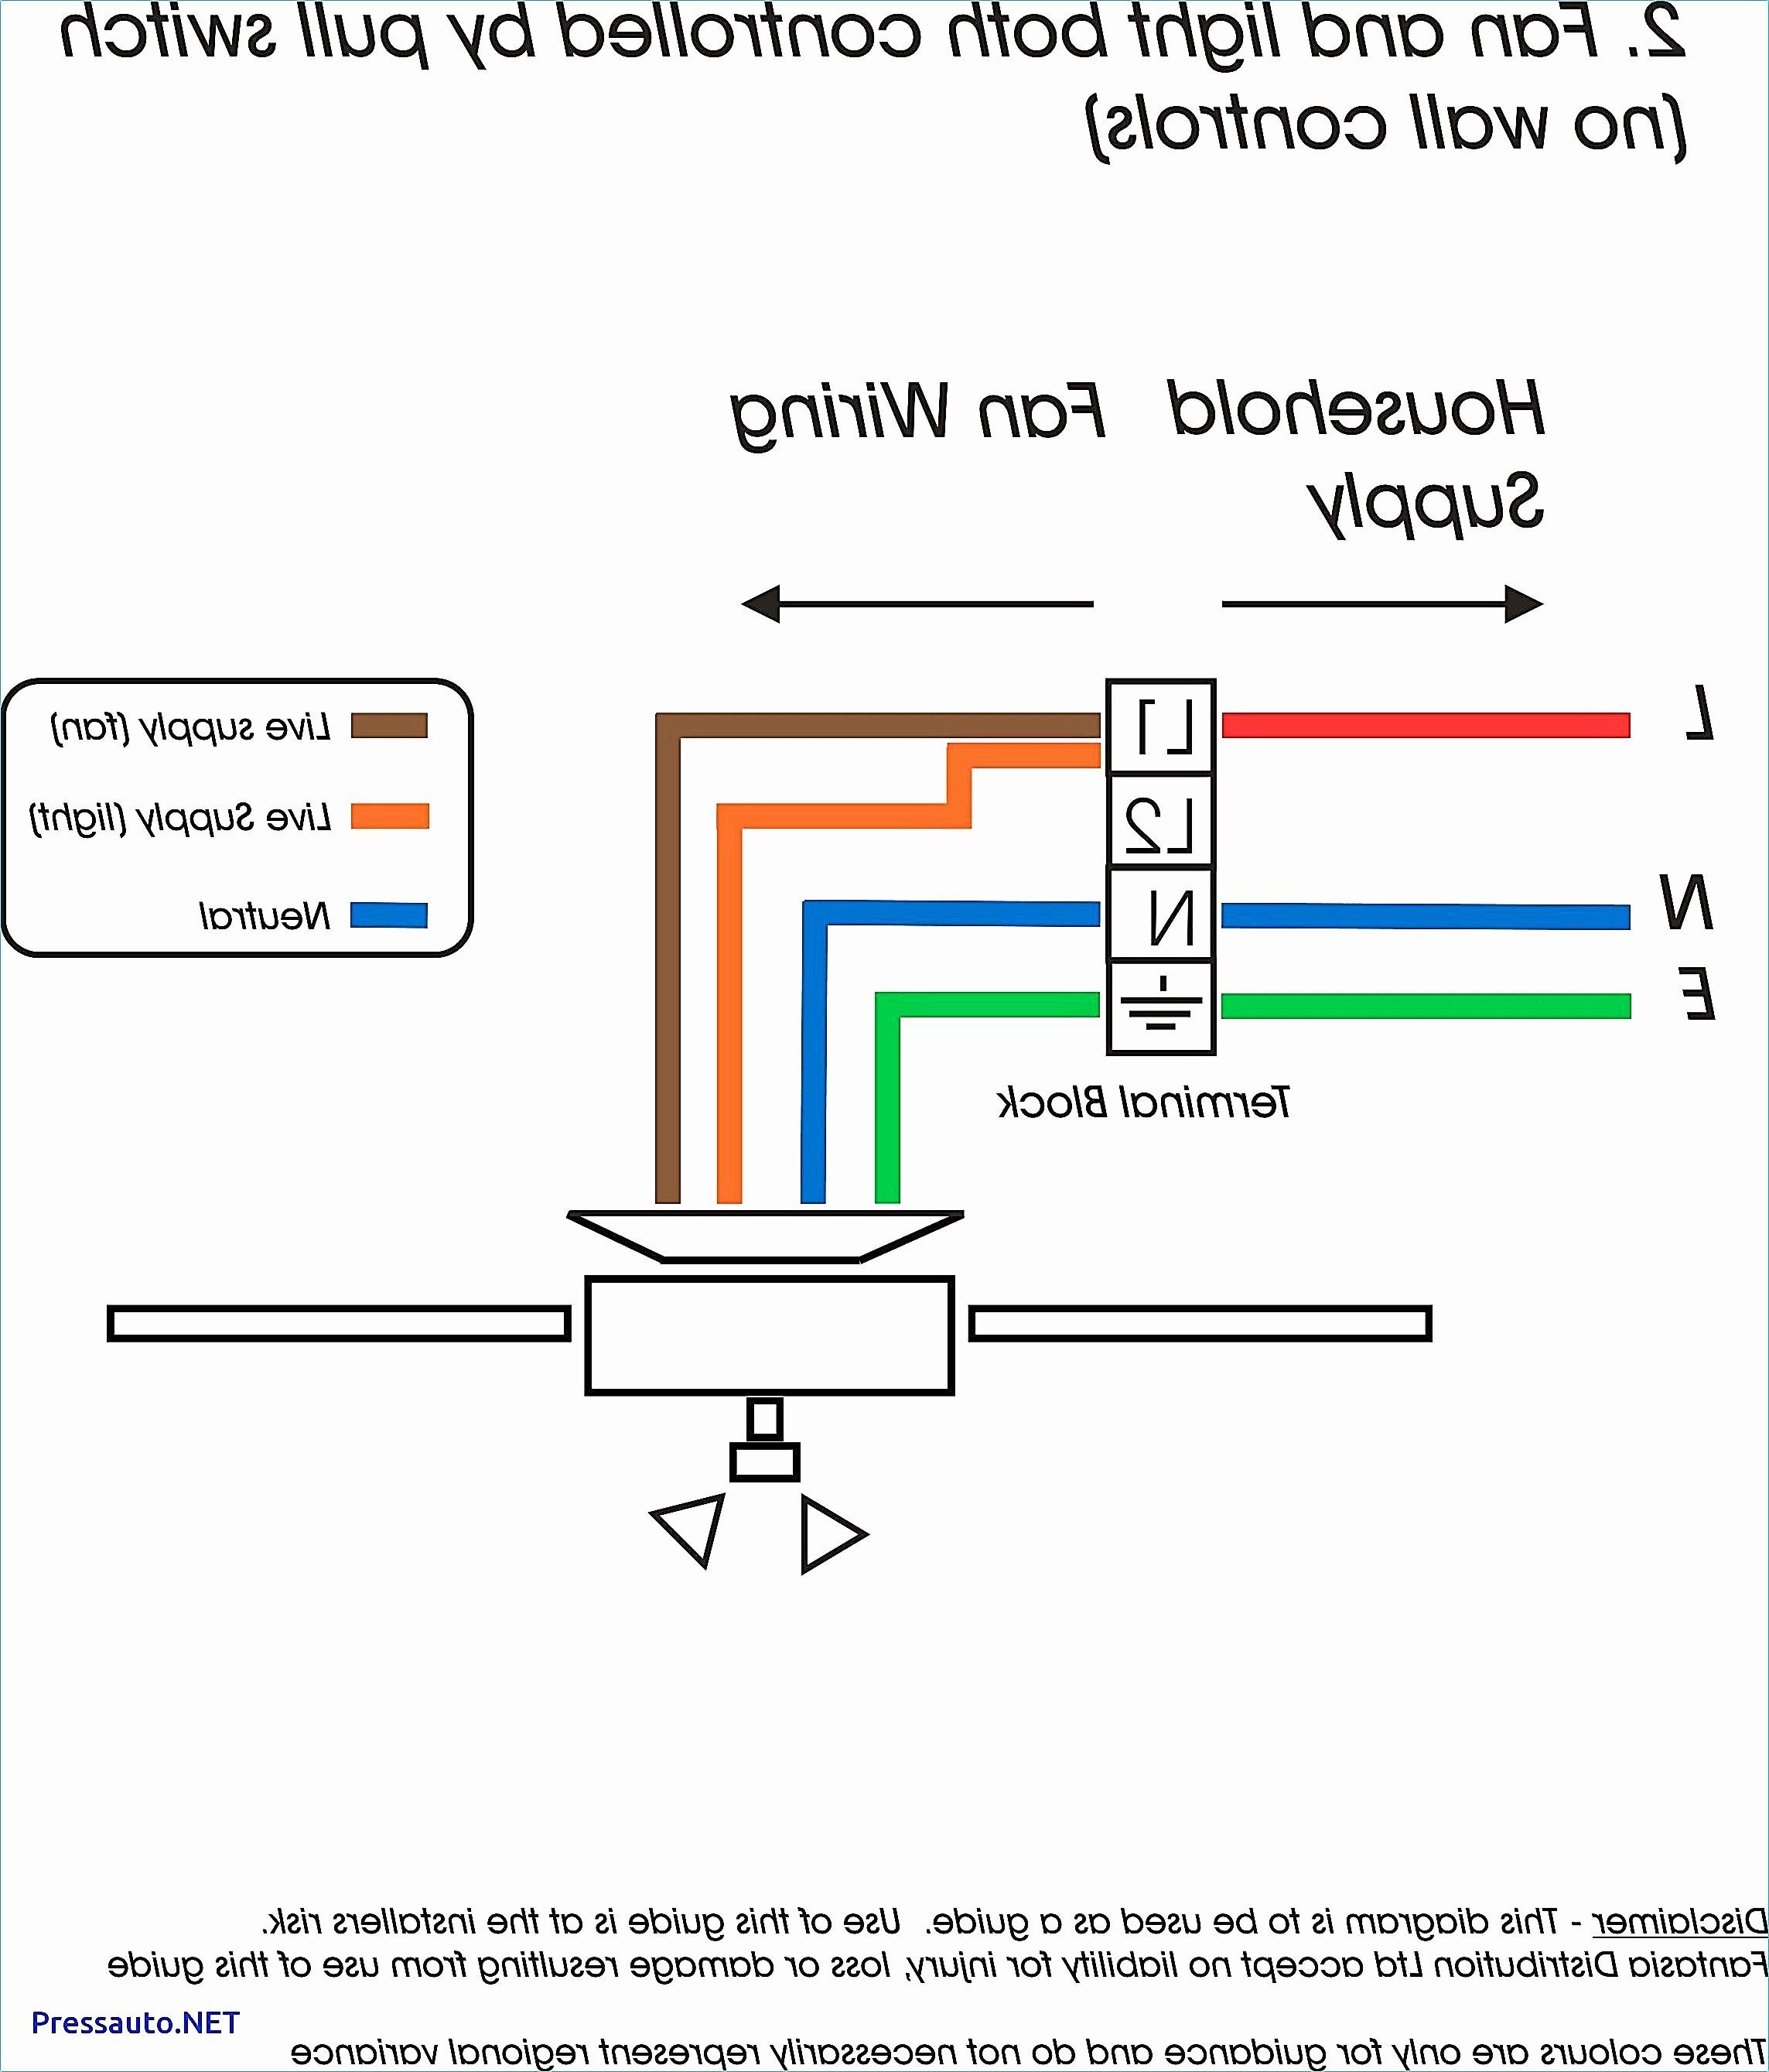 Recessed lighting wiring diagram sample wiring diagram sample recessed lighting wiring diagram collection wiring diagram recessed lighting valid recessed lighting wiring diagram awesome download wiring diagram cheapraybanclubmaster Choice Image